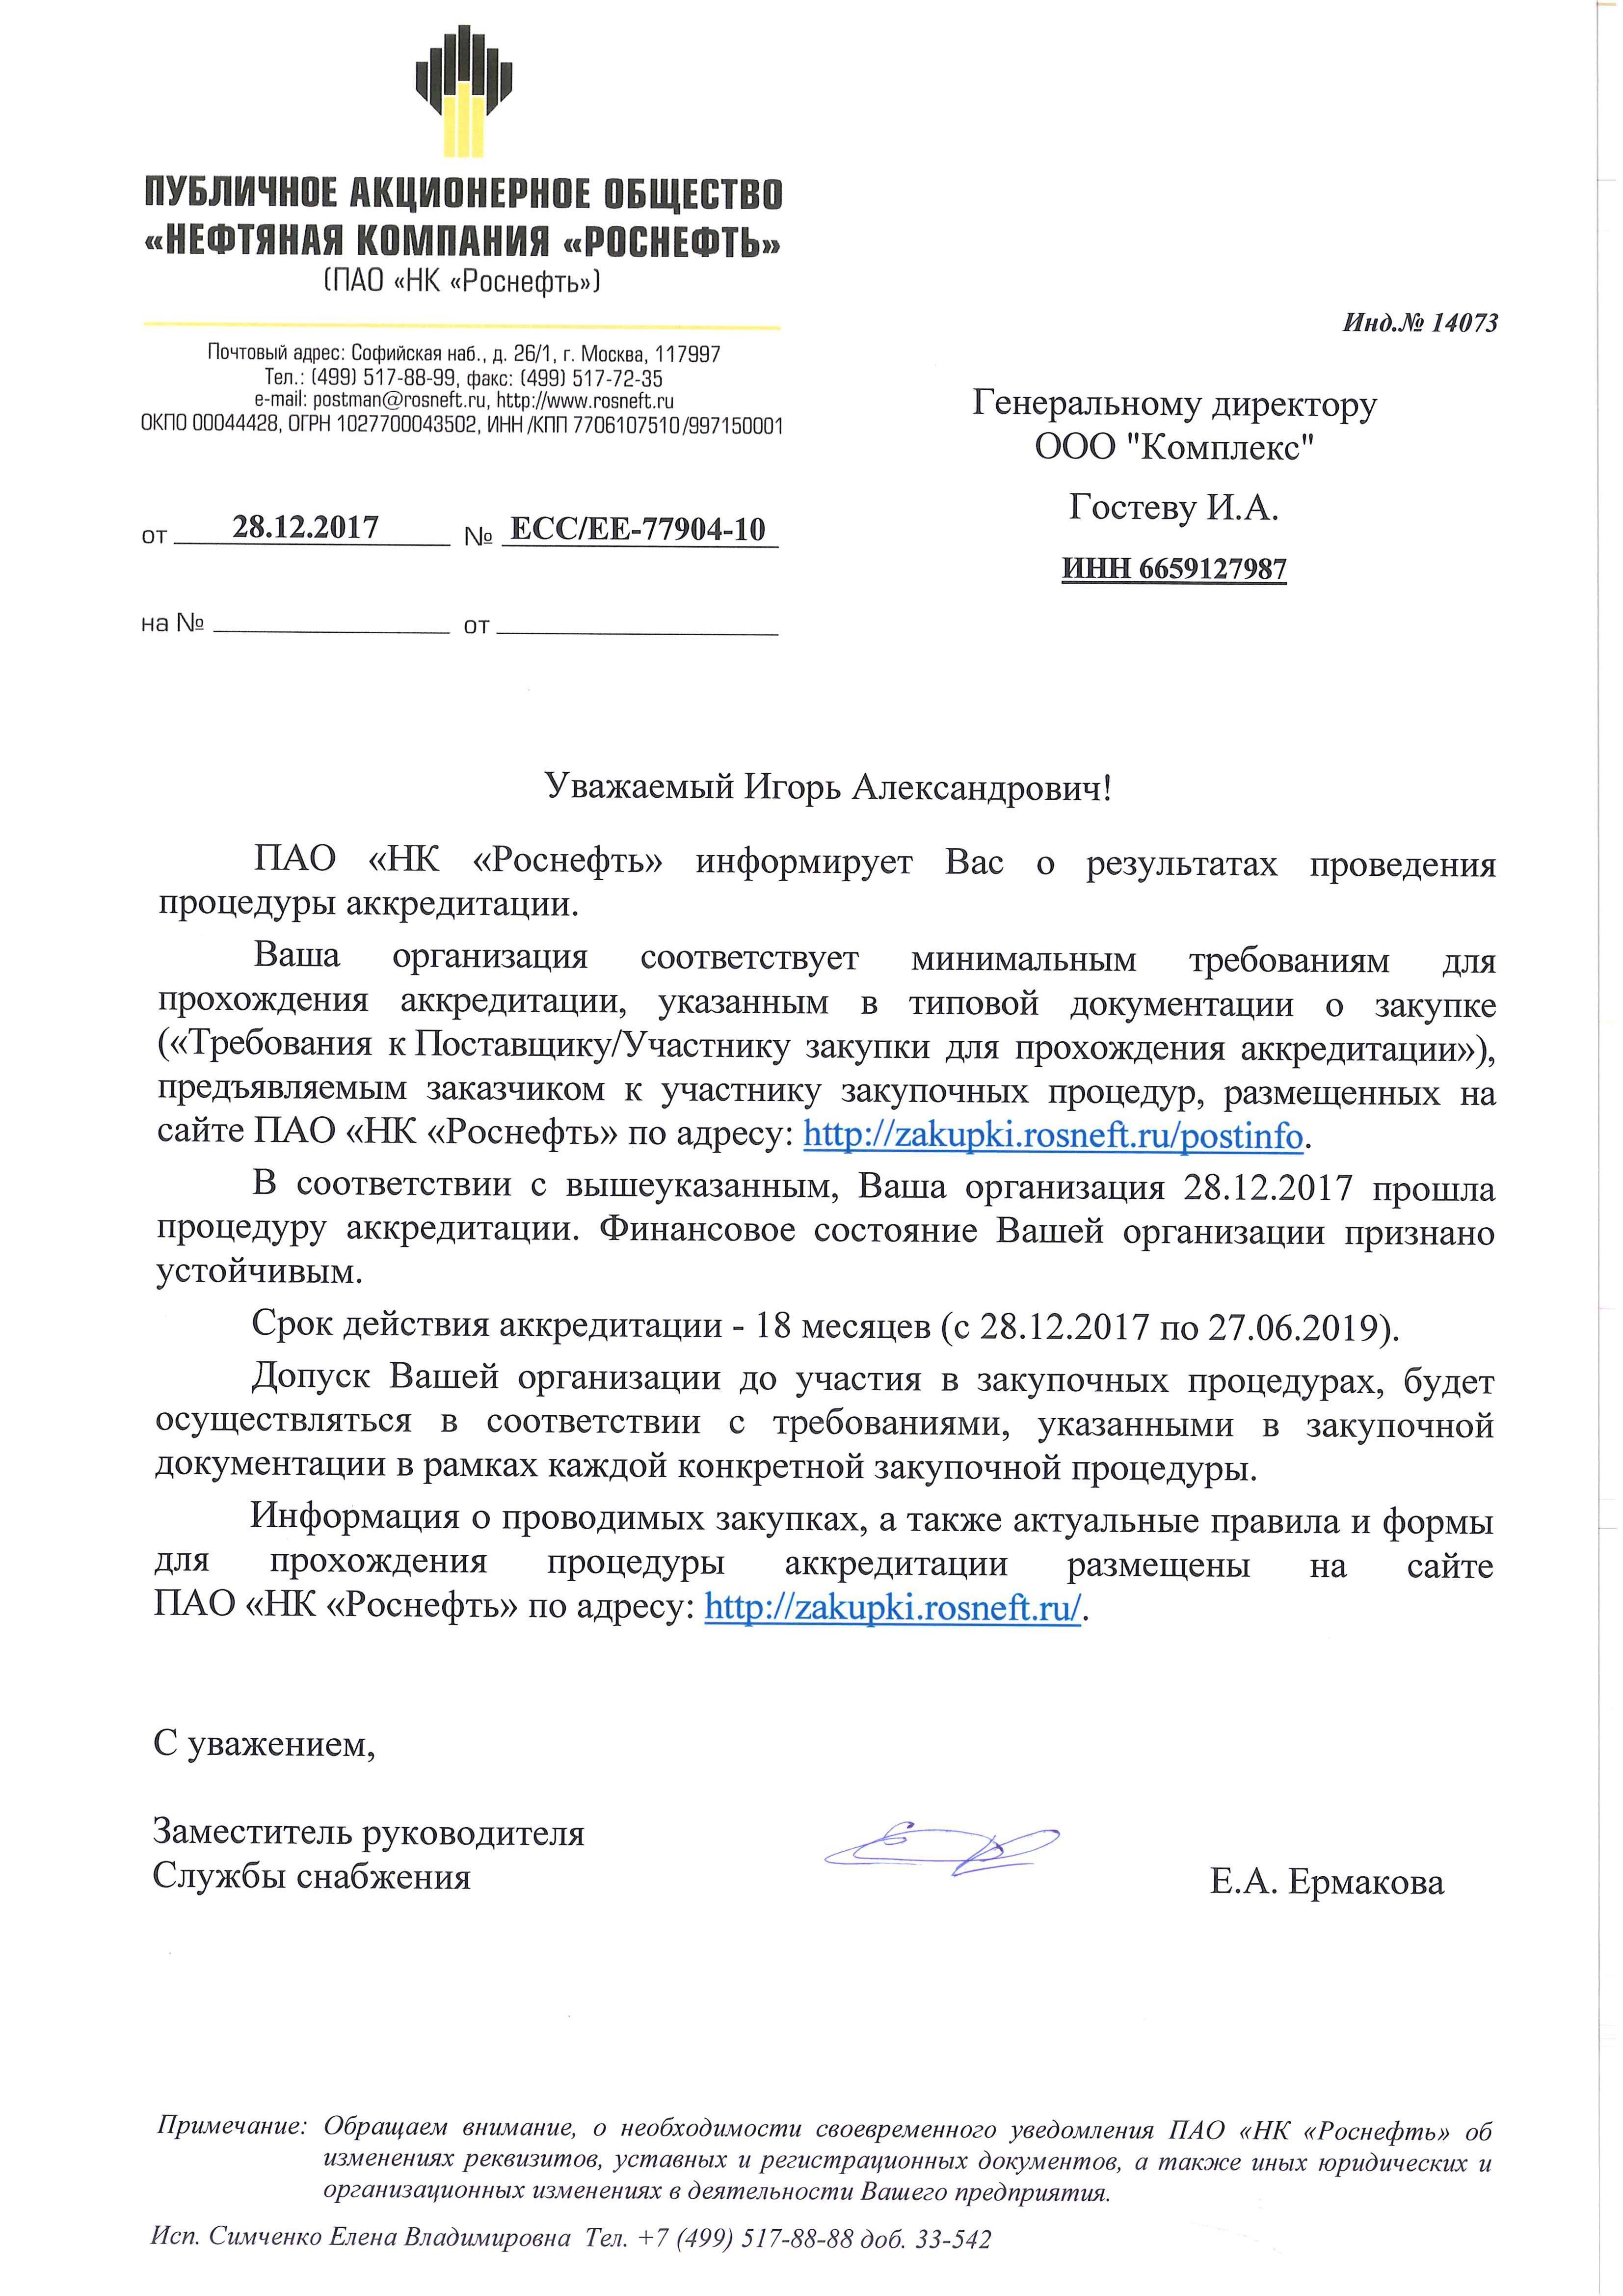 Аккредитация Роснефть до 27.06.2019